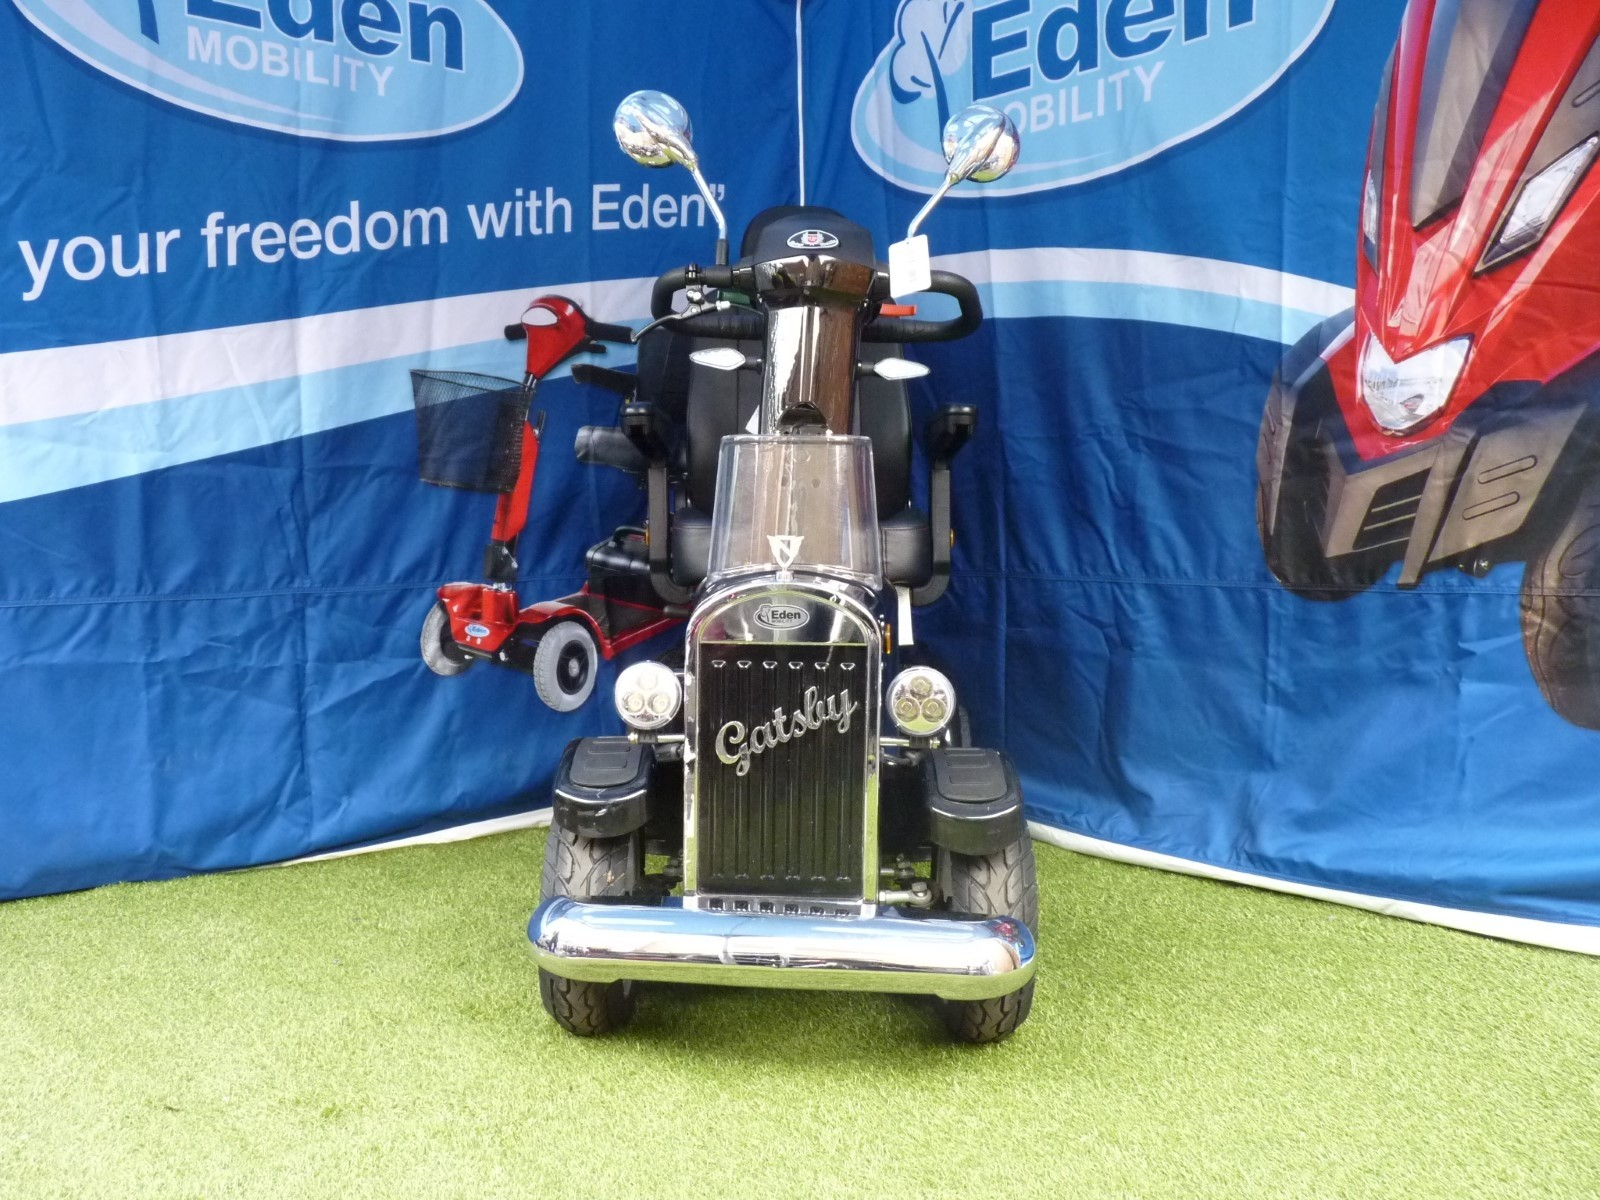 Eden Mobility Gatsby Black